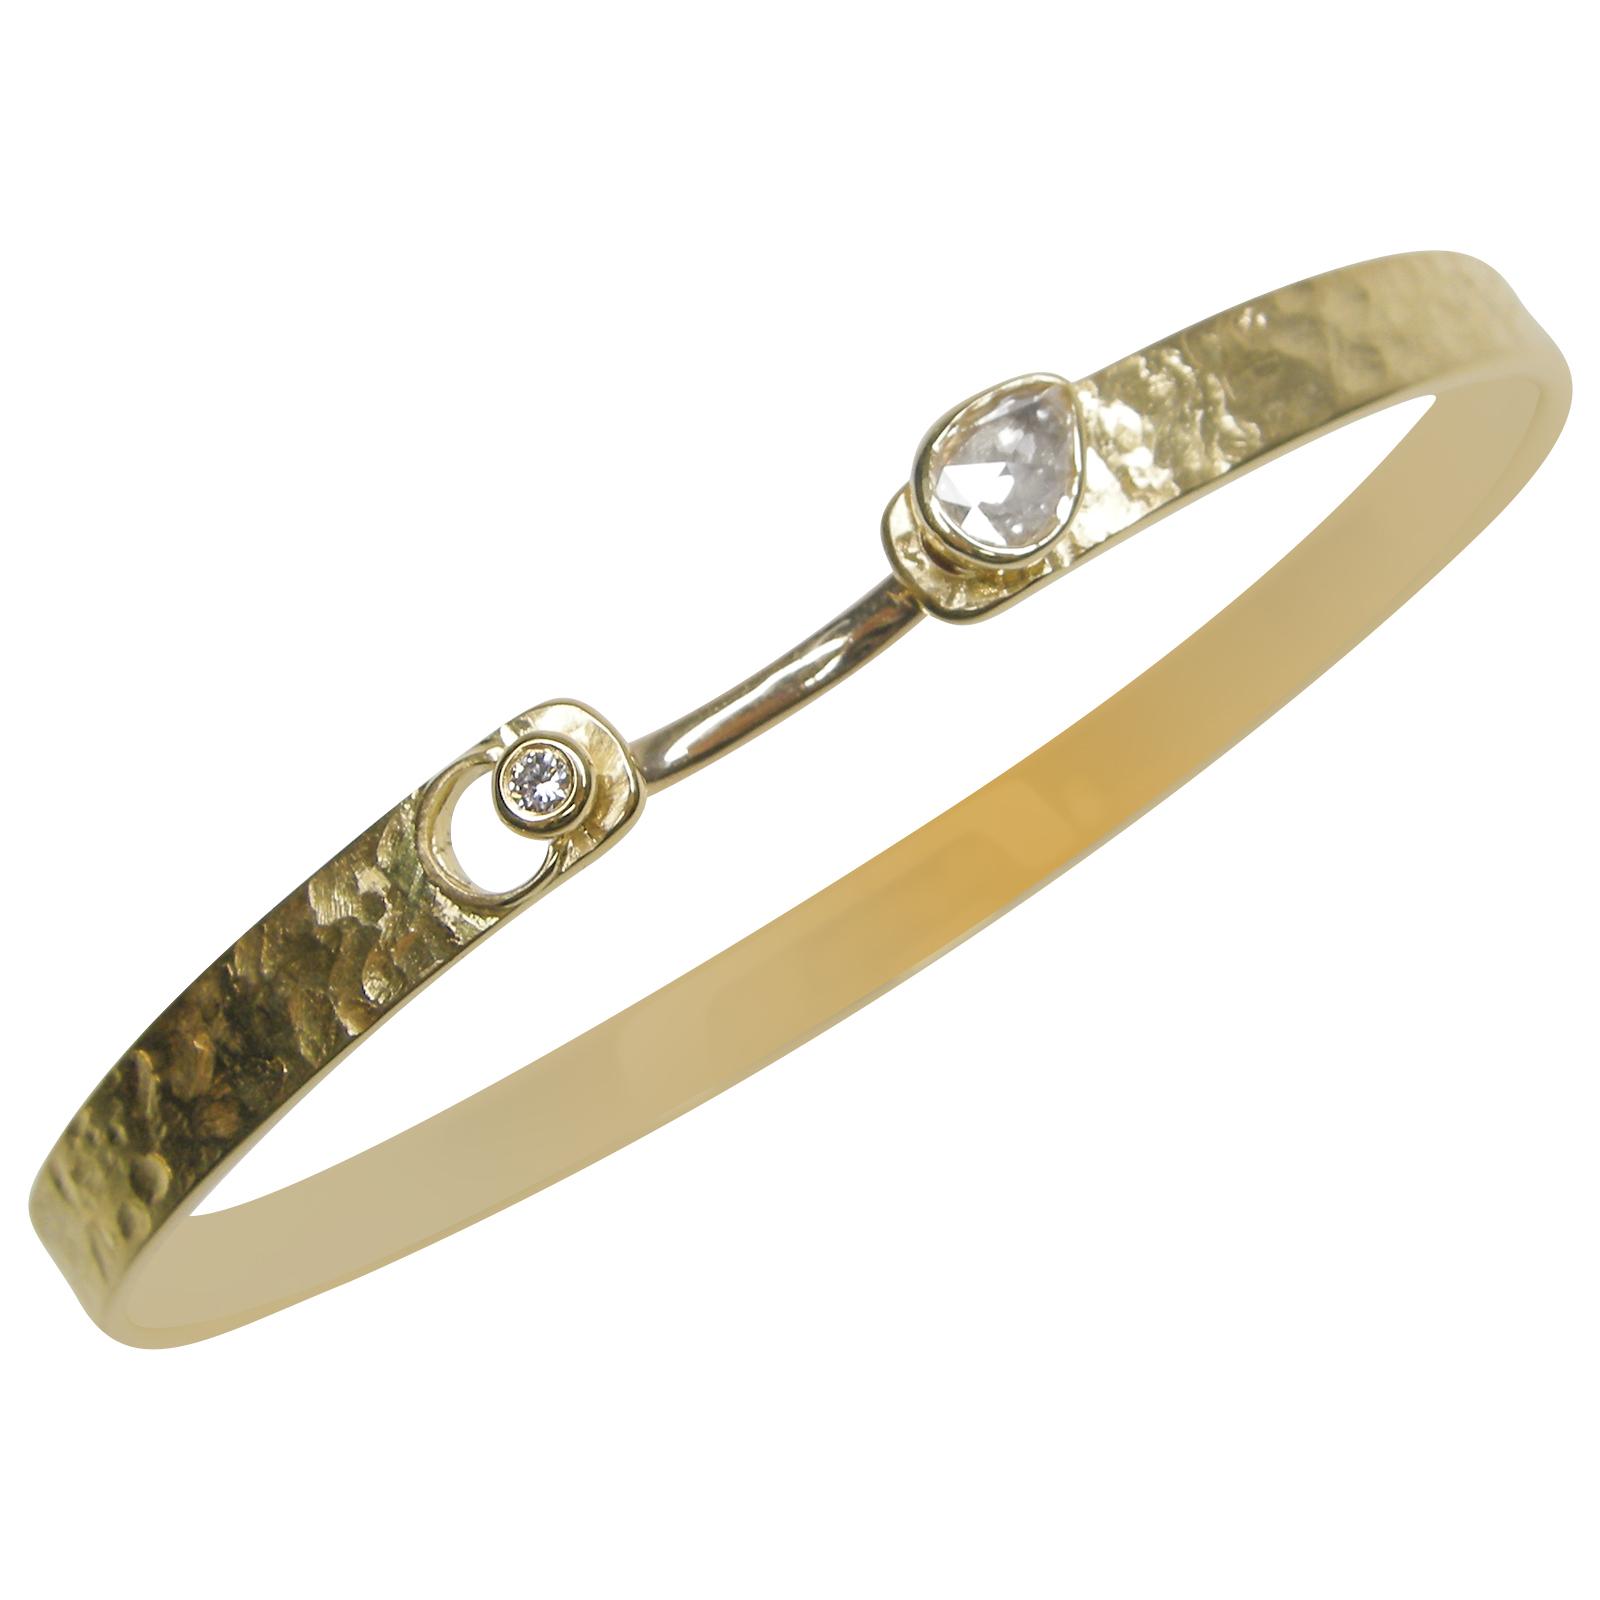 YELLOW GOLD DIAMOND BRACELET CUFF